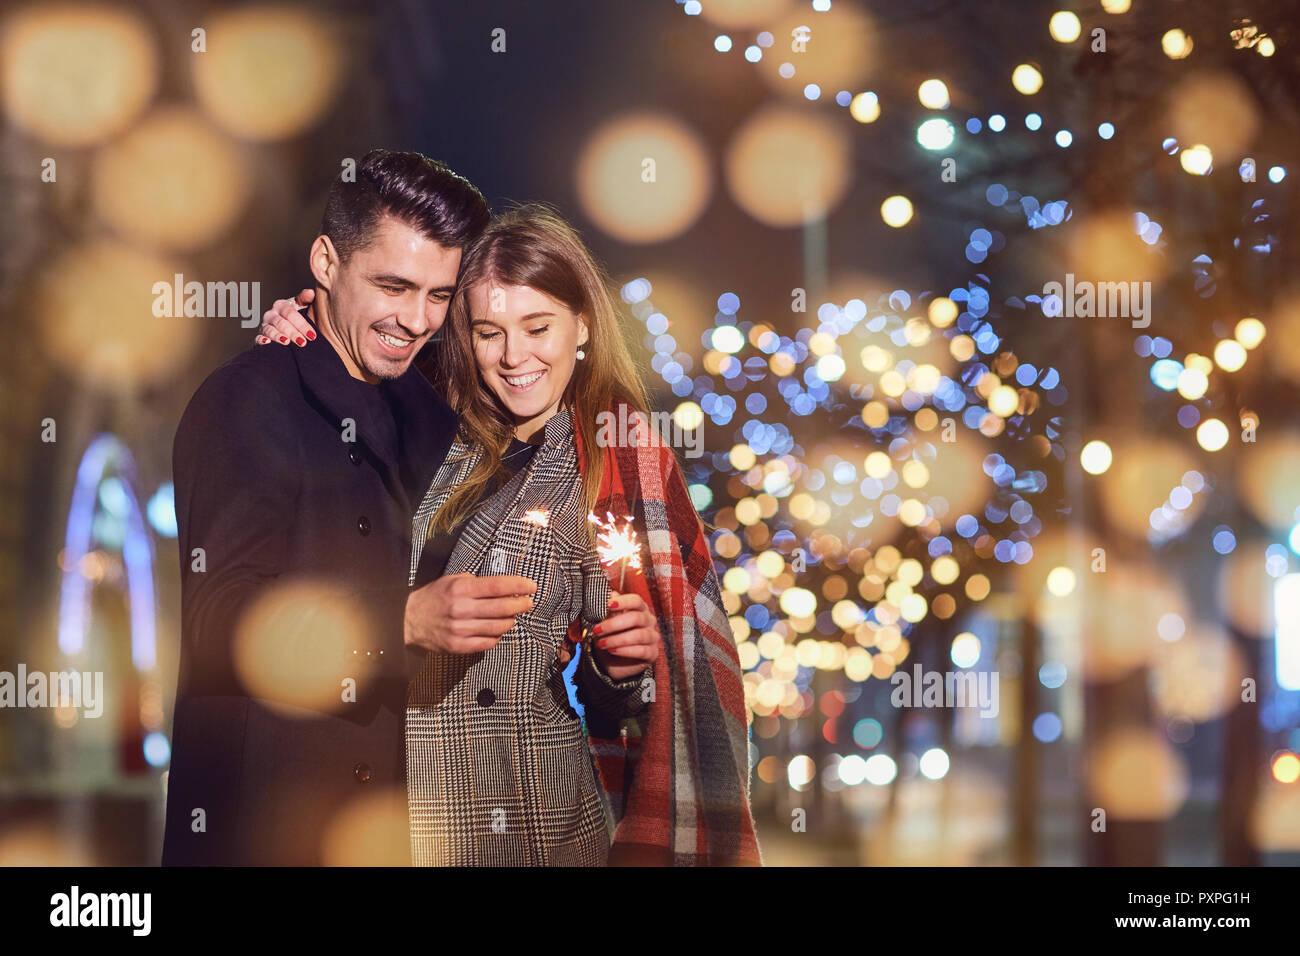 Bengalische Amerikanische Dating Alle Dating-Website in Deutschland